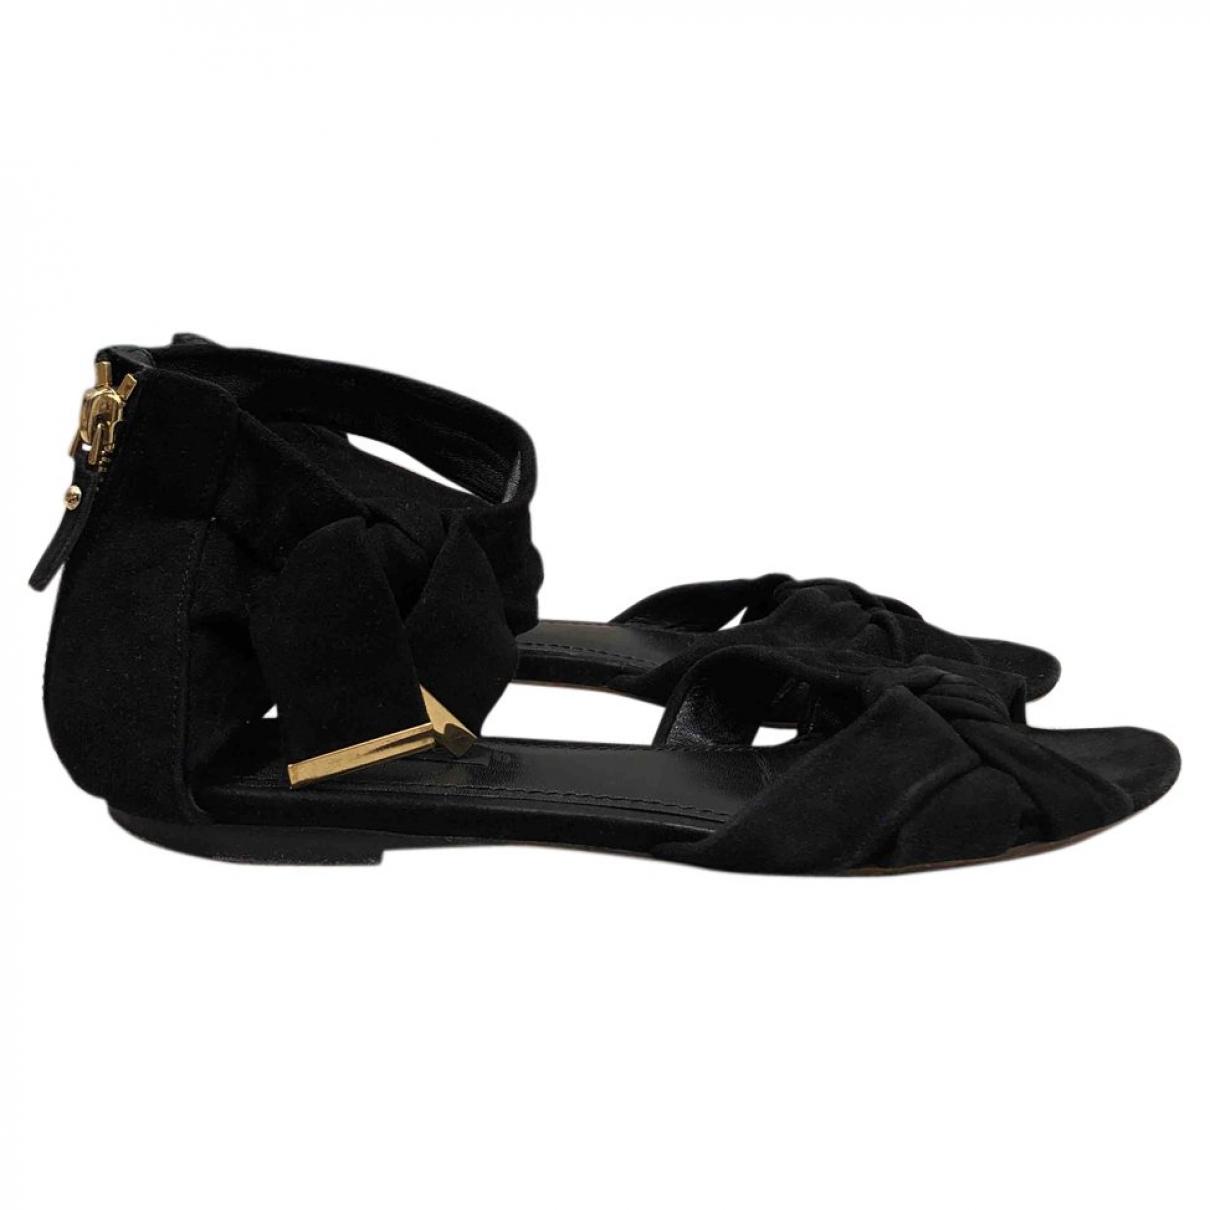 Louis Vuitton \N Black Suede Sandals for Women 37 EU